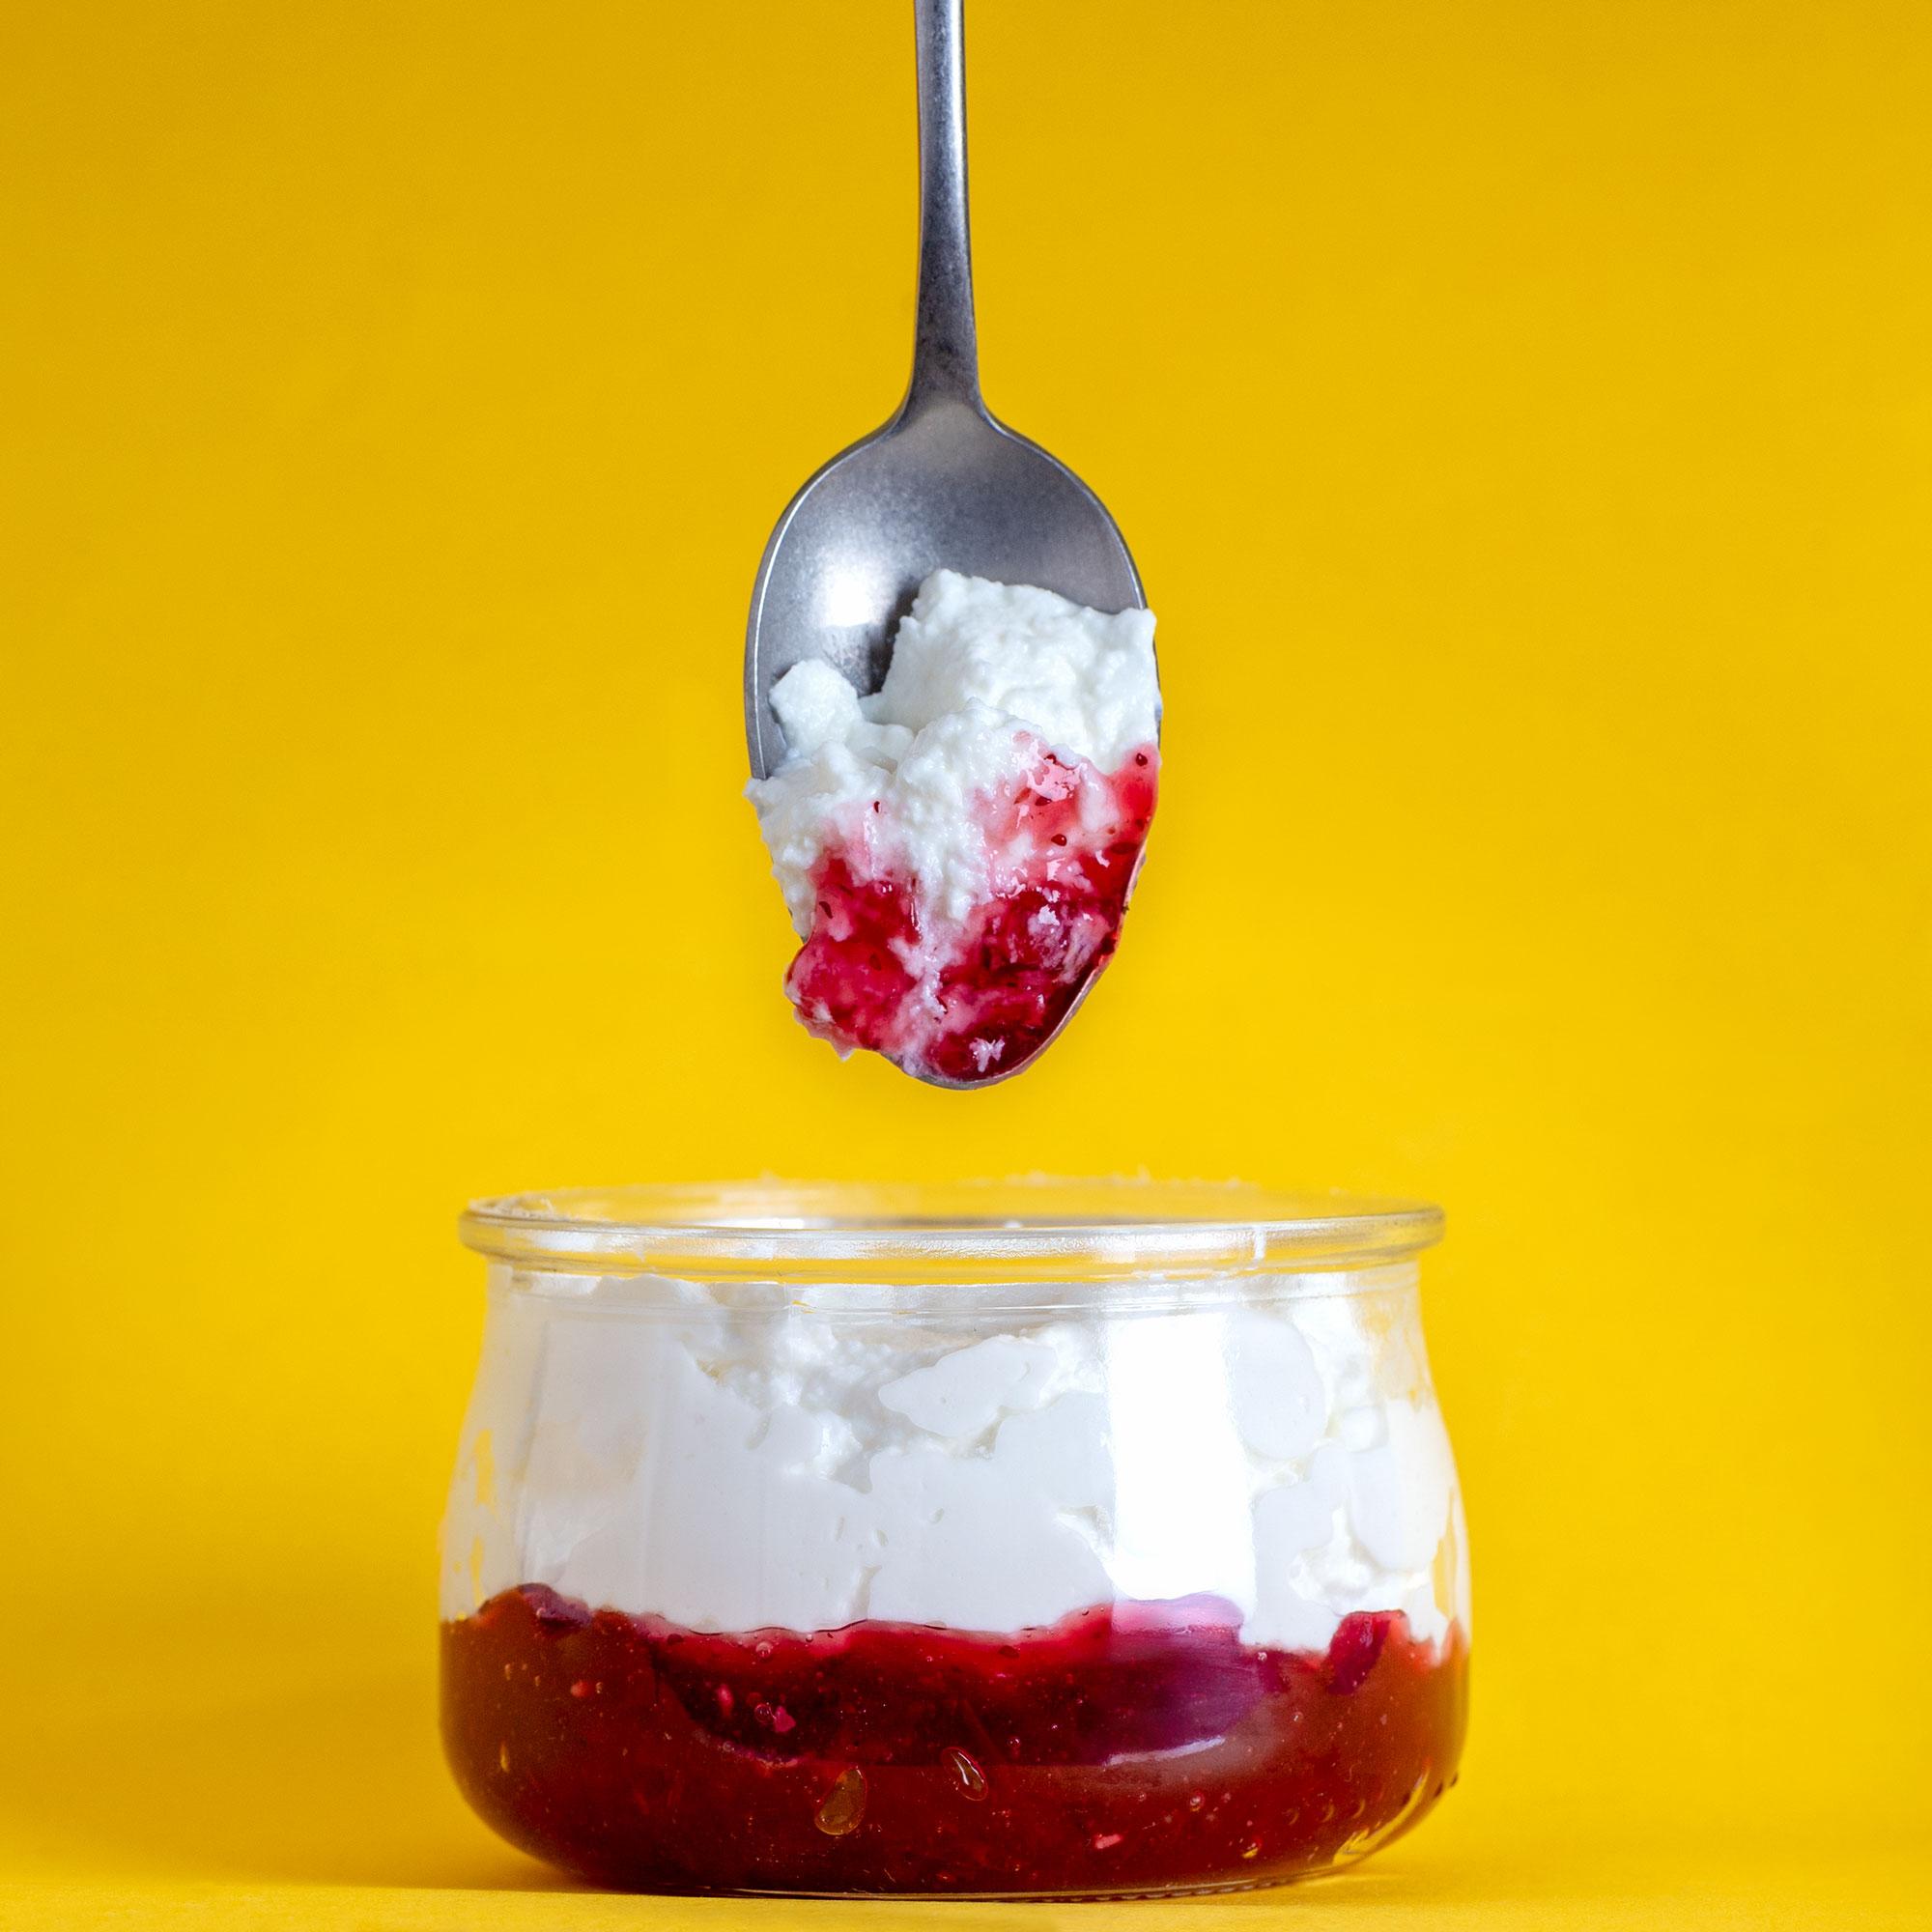 corina-landa-food-photography-fotografia-gastronomica-0188.jpg